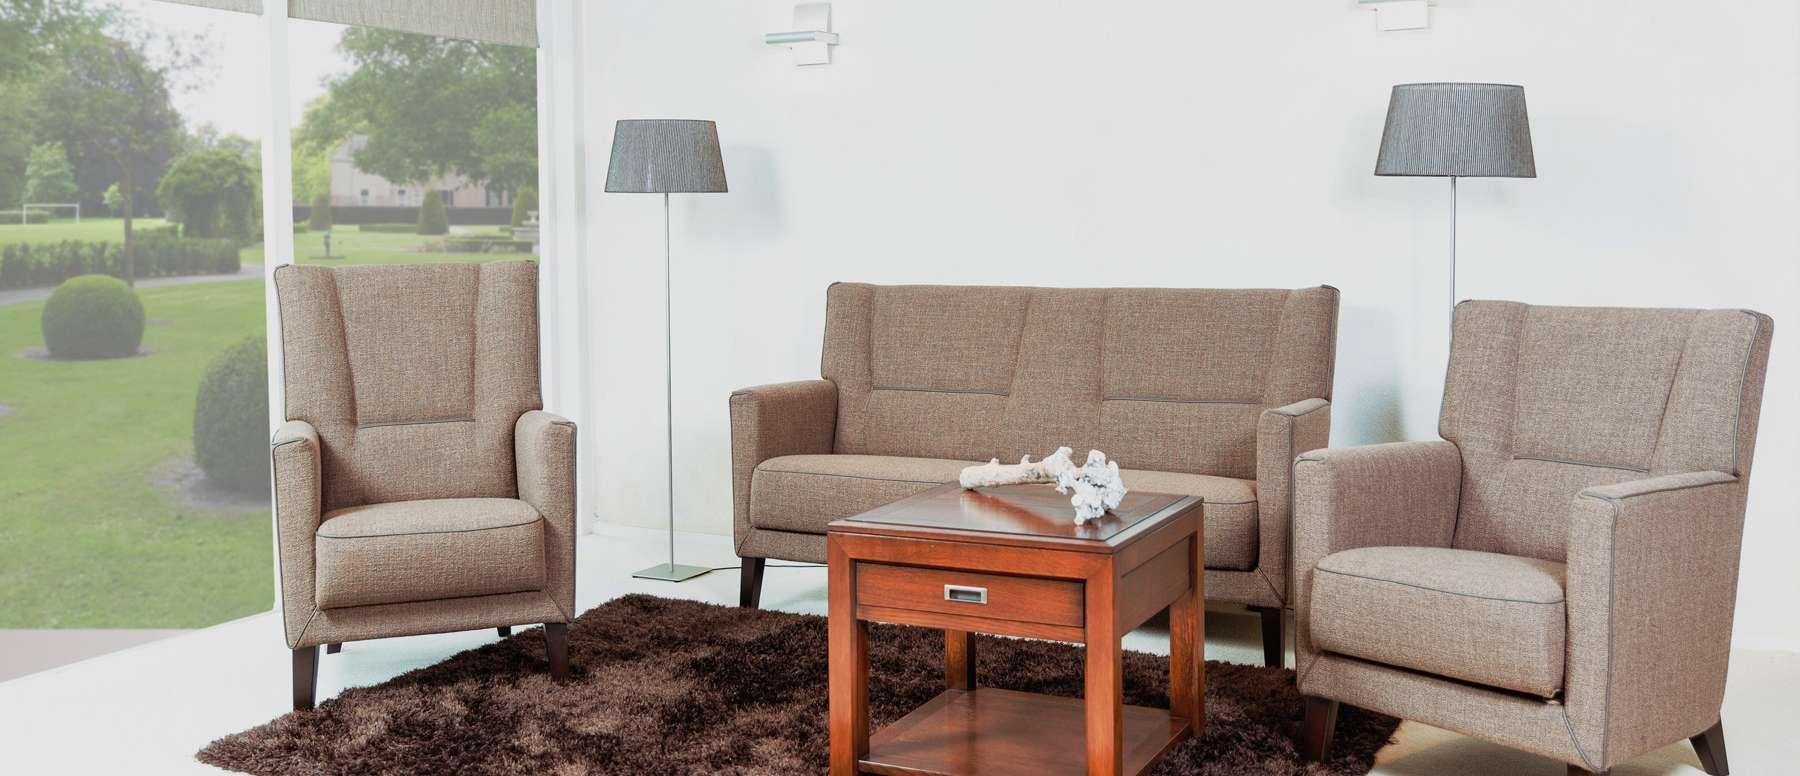 DN design meubelen 4